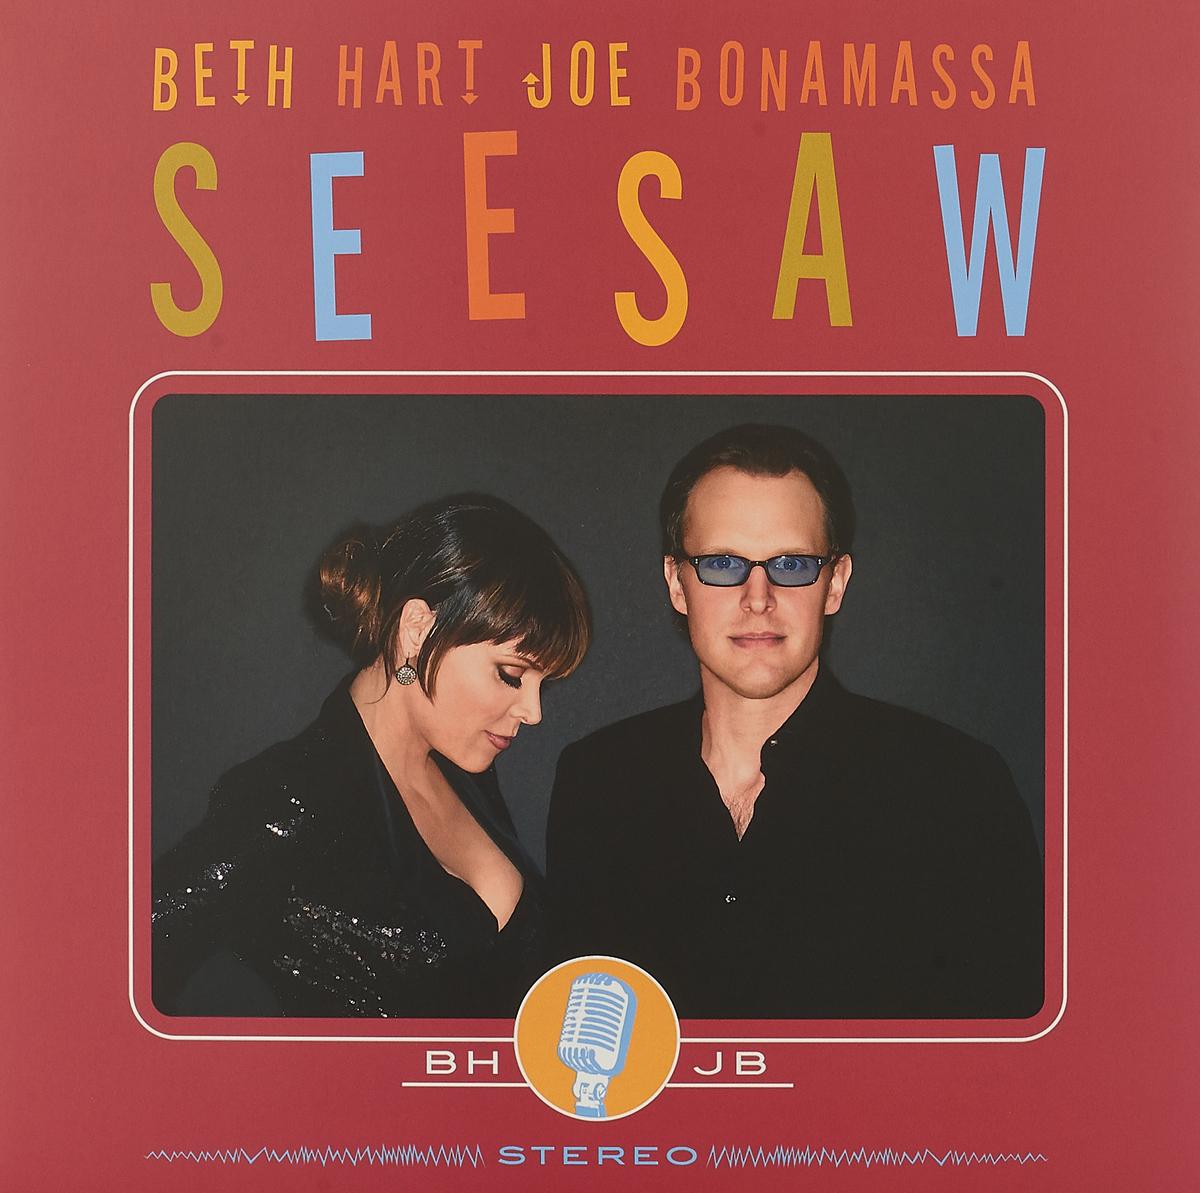 Бет Хат,Джо Бонамасса Beth Hart & Joe Bonamassa. Seesaw (LP) beth hart milano